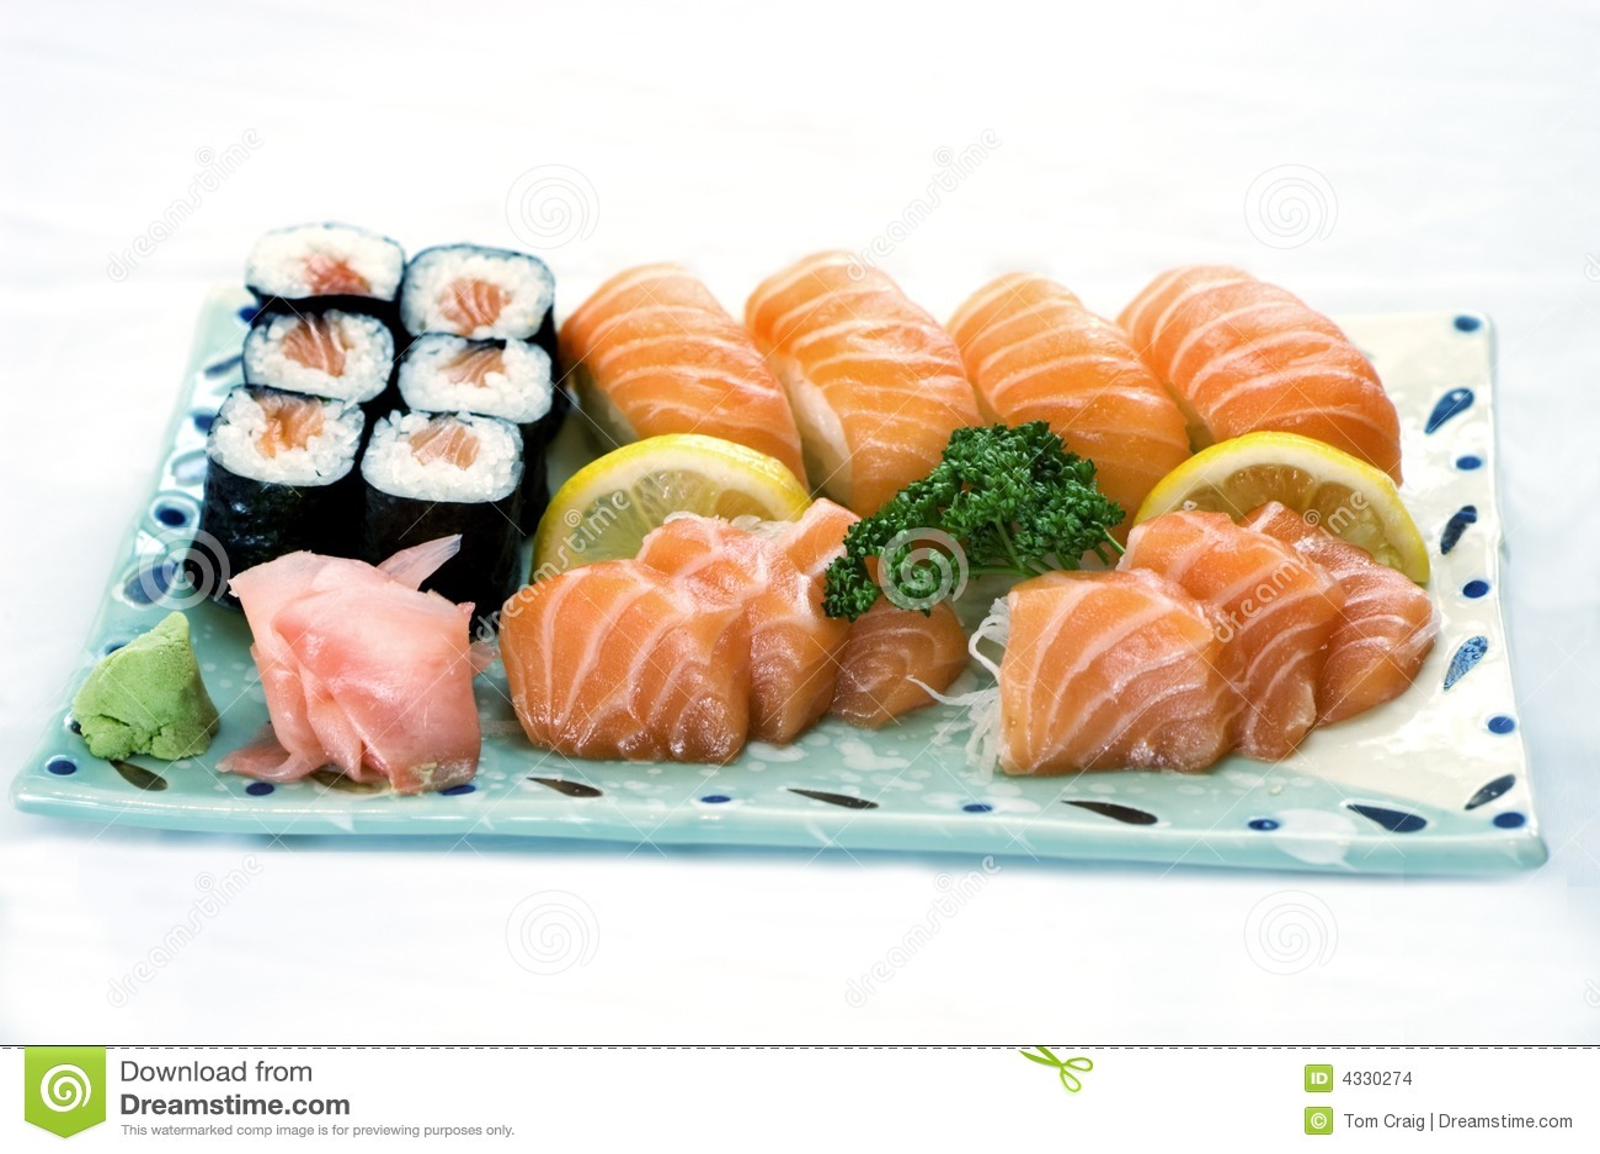 Japanese Food, Mixed Menu, Plate of Sashimi,